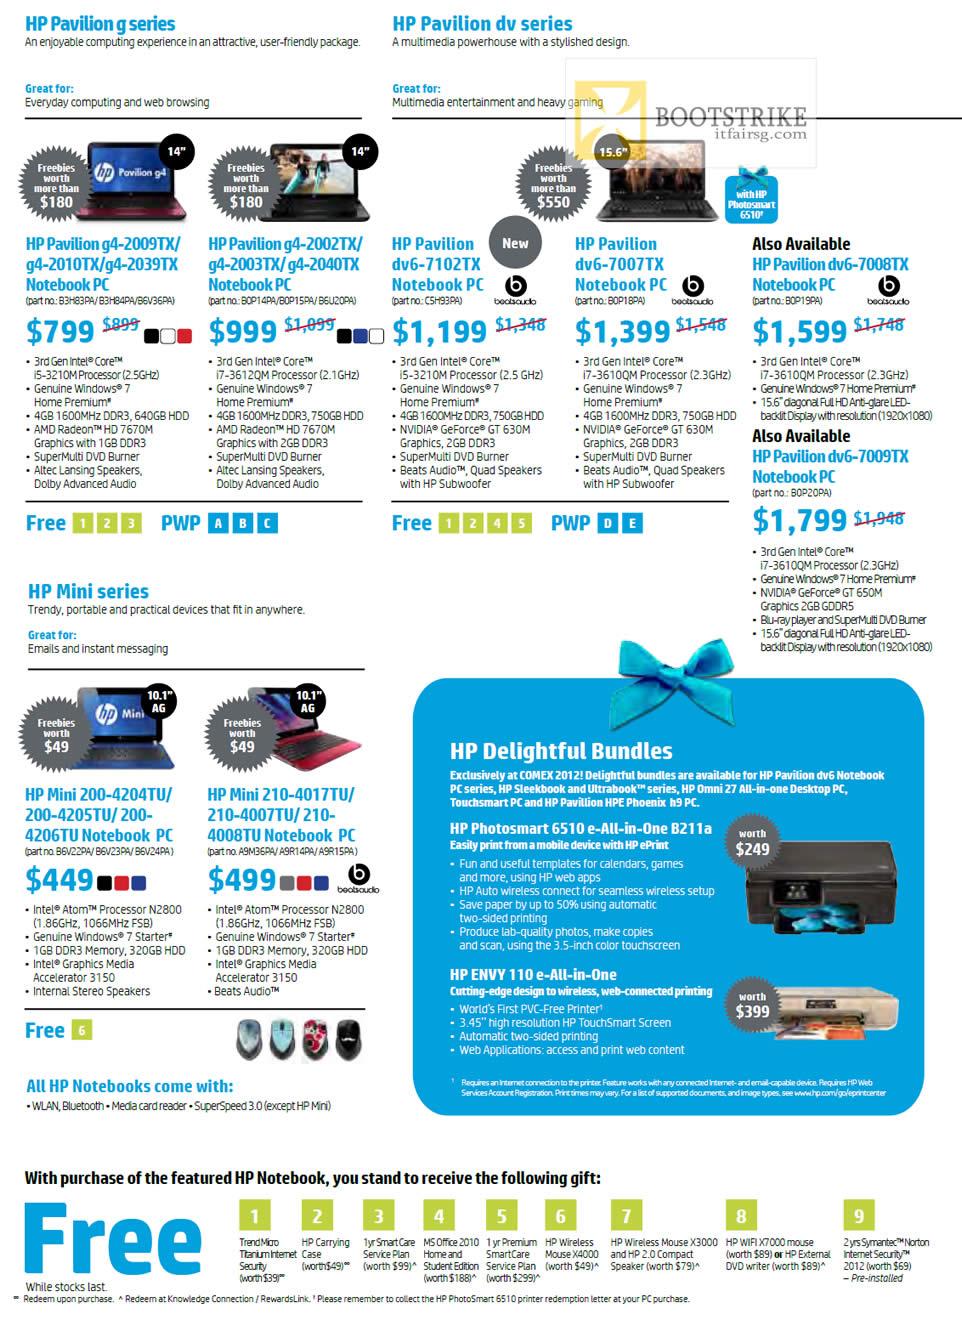 COMEX 2012 price list image brochure of HP Notebooks Pavilion G4 2009TX 2010TX 2039TX 2002TX 2003TX 2040TX, Dv6 7102TX 7007TX 7008TX 7009TX, Mini 200-4204TU 4205TU 4206TU, 210 4017TU 4007TU 4008TU